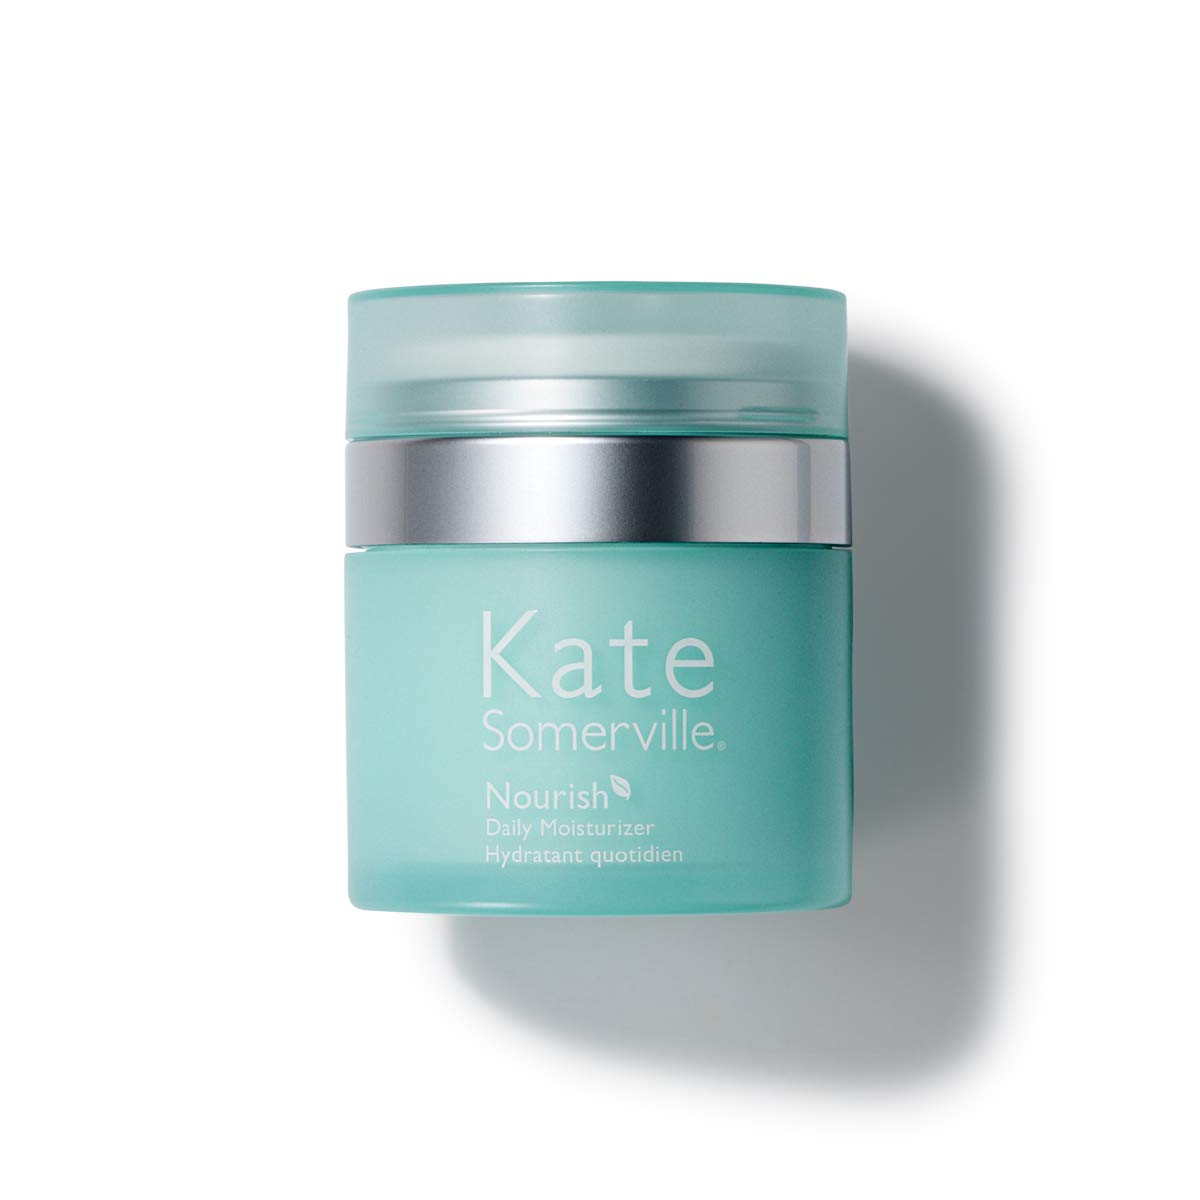 Kate Somerville's Nourish Daily Moisturizer - Hydrating Face Cream - Anti-Aging Face Cream (1.7 Fl. Oz.)